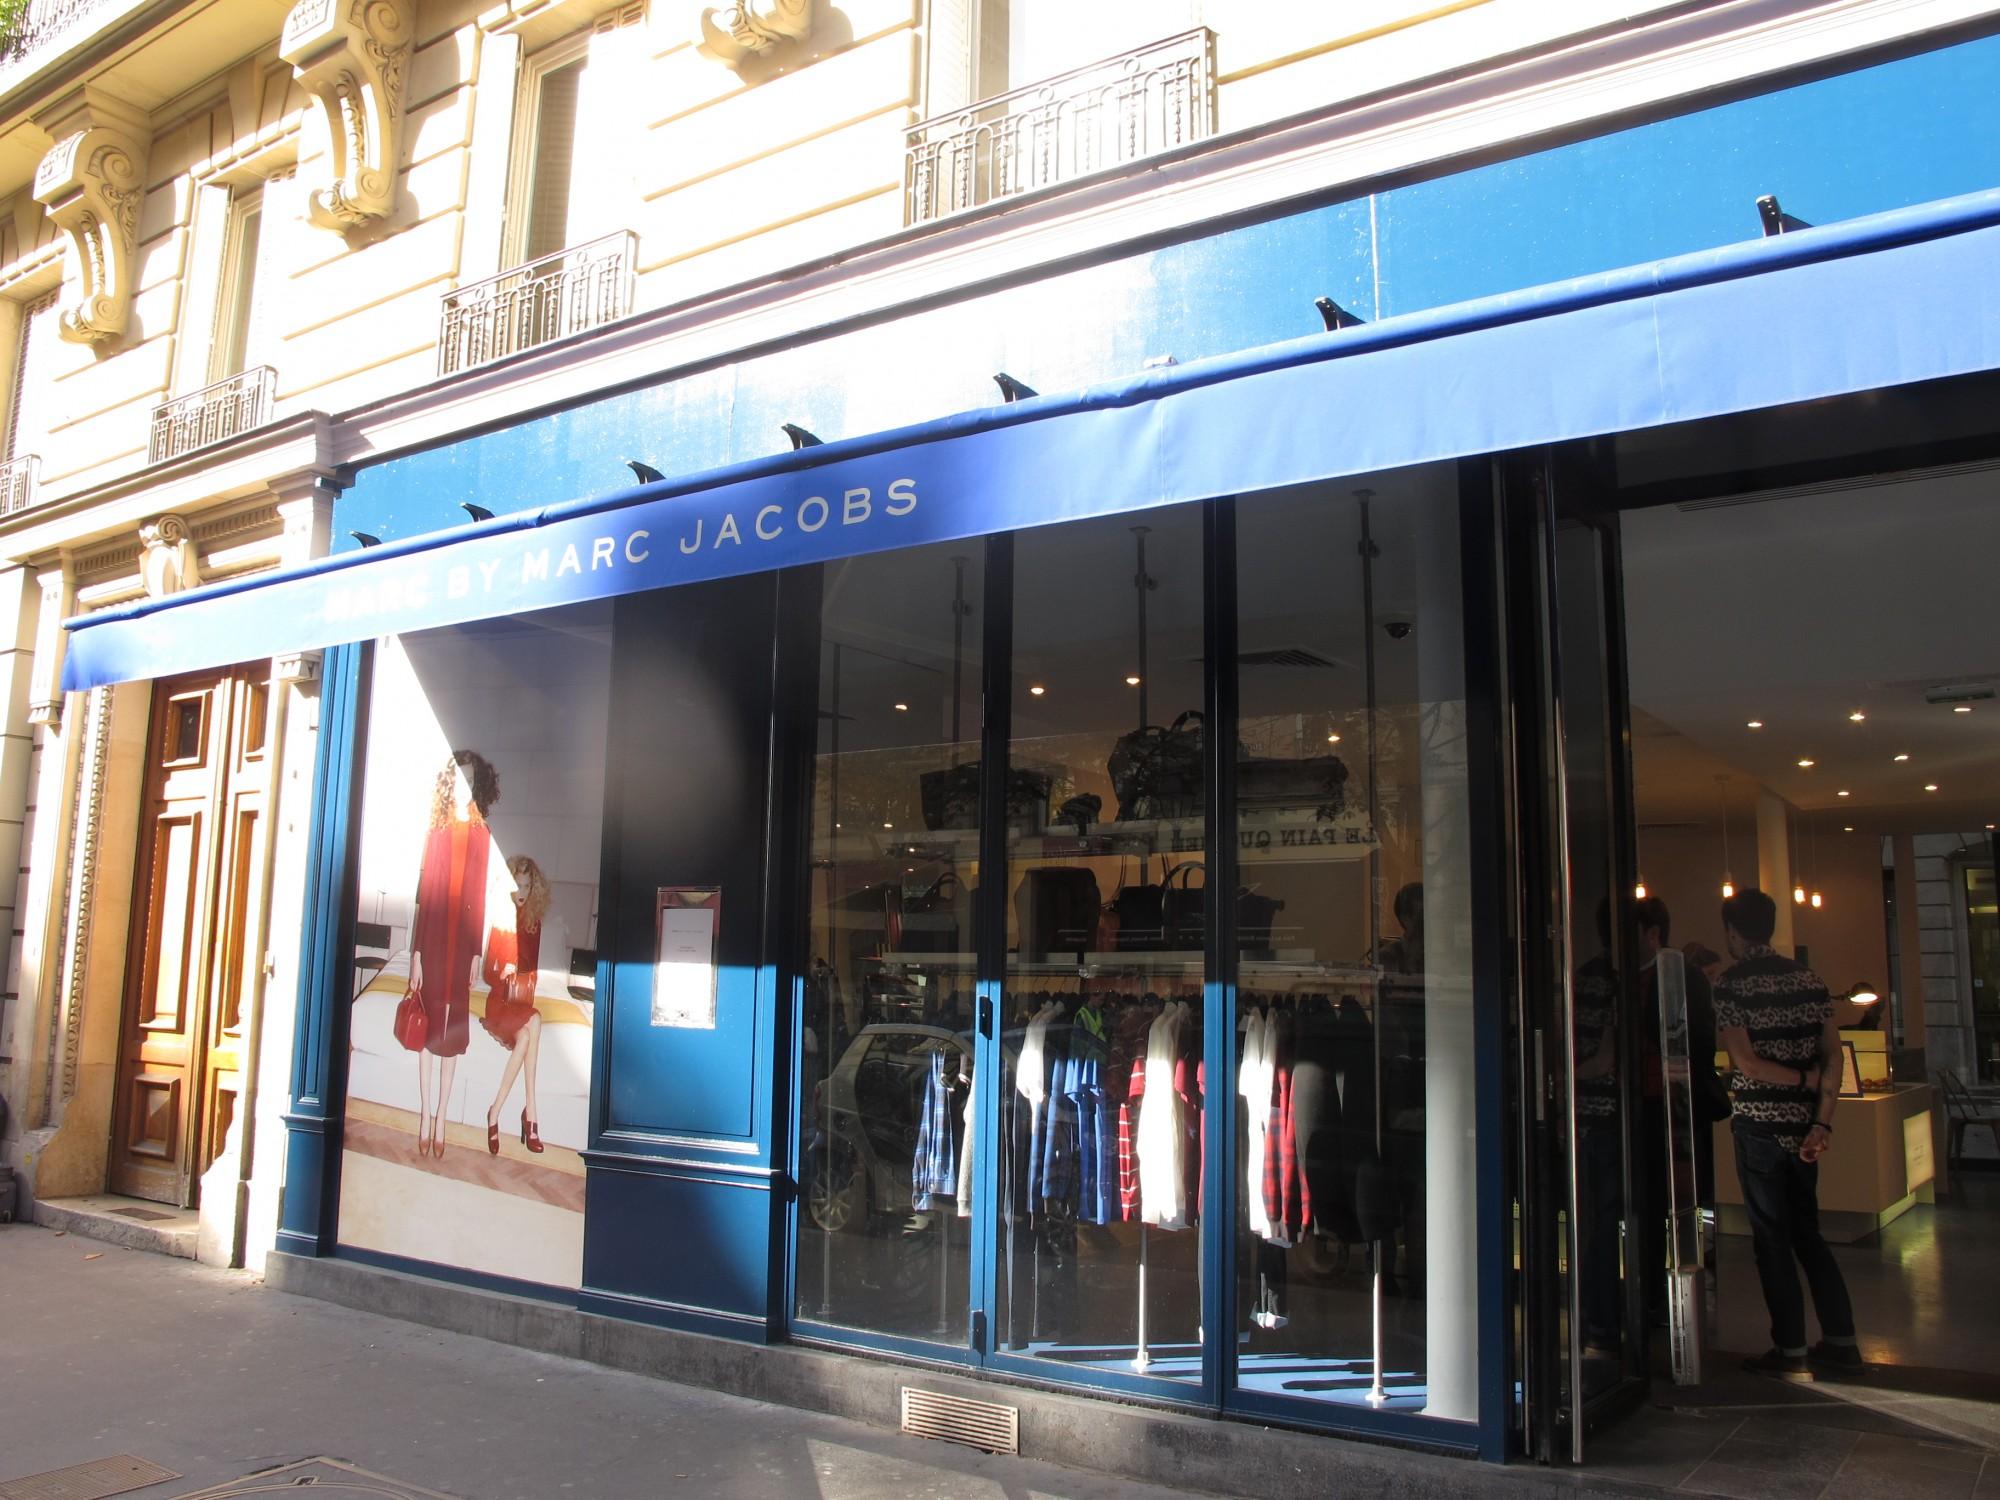 ca82b1d0f6480 Popup store Marc by Marc Jacobs - The parisienne